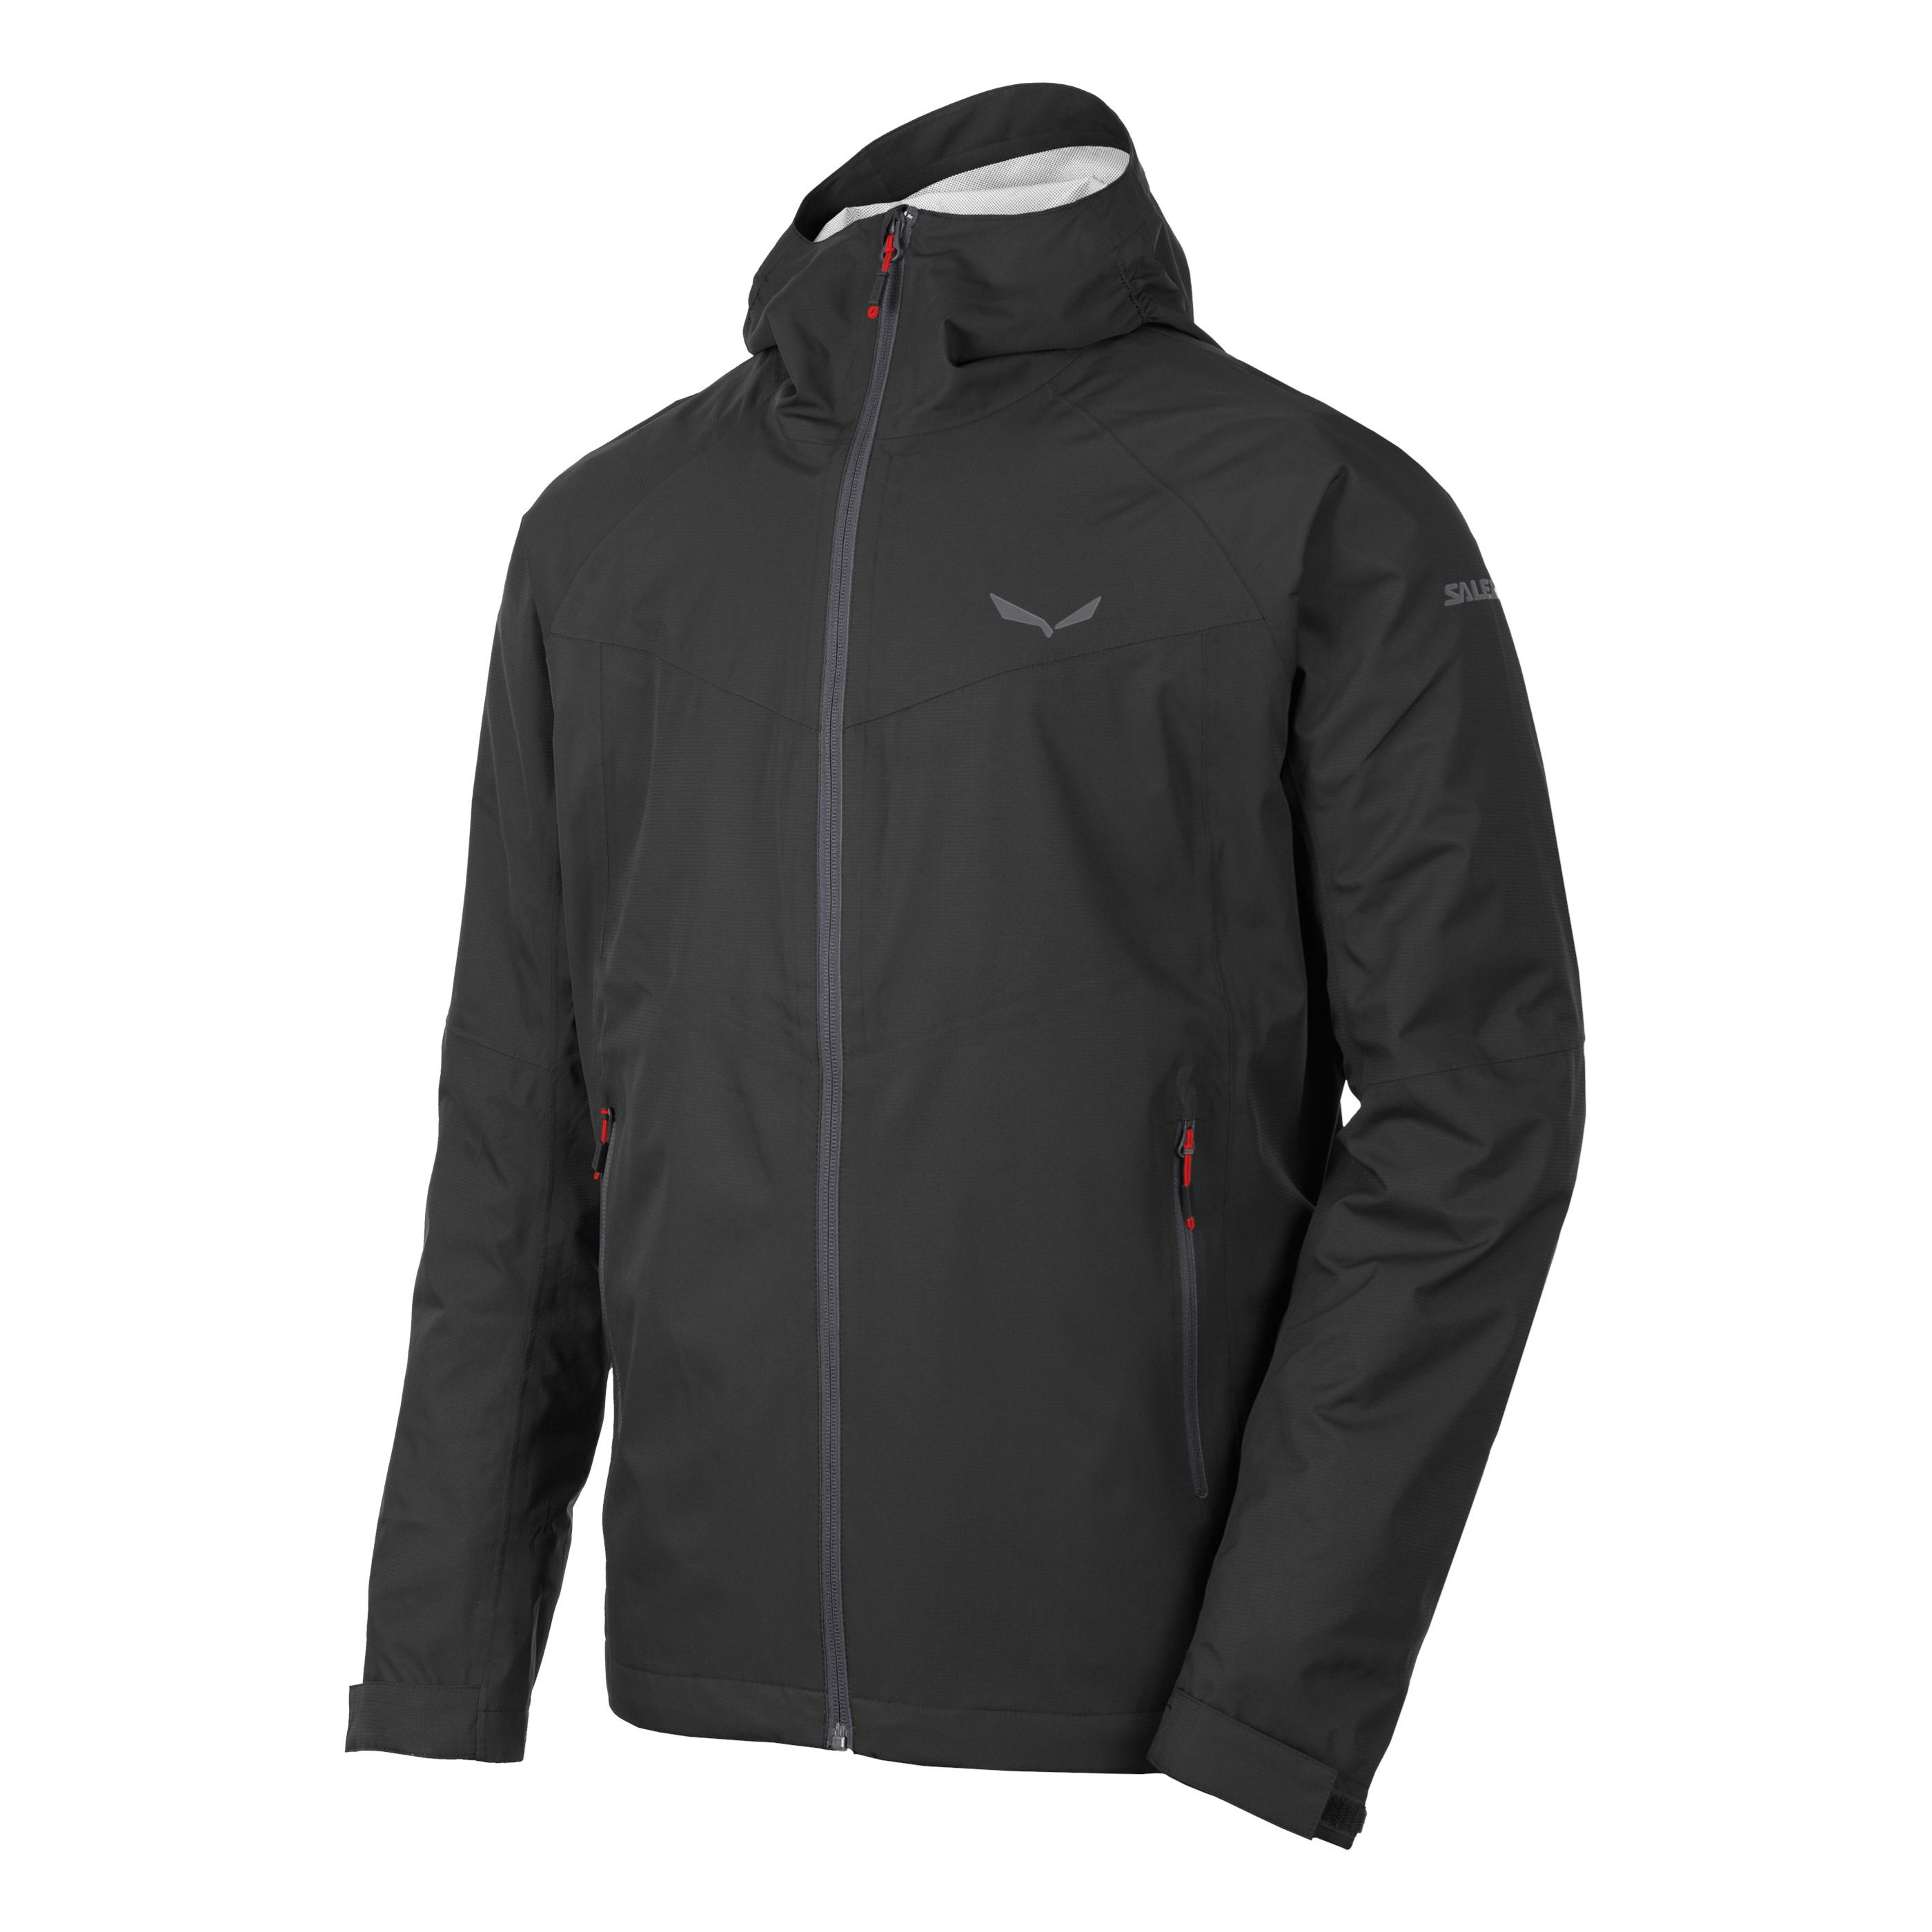 Salewa - Puez (Aqua 3) Powertex M Jacket - Hardshell jacket - Men's